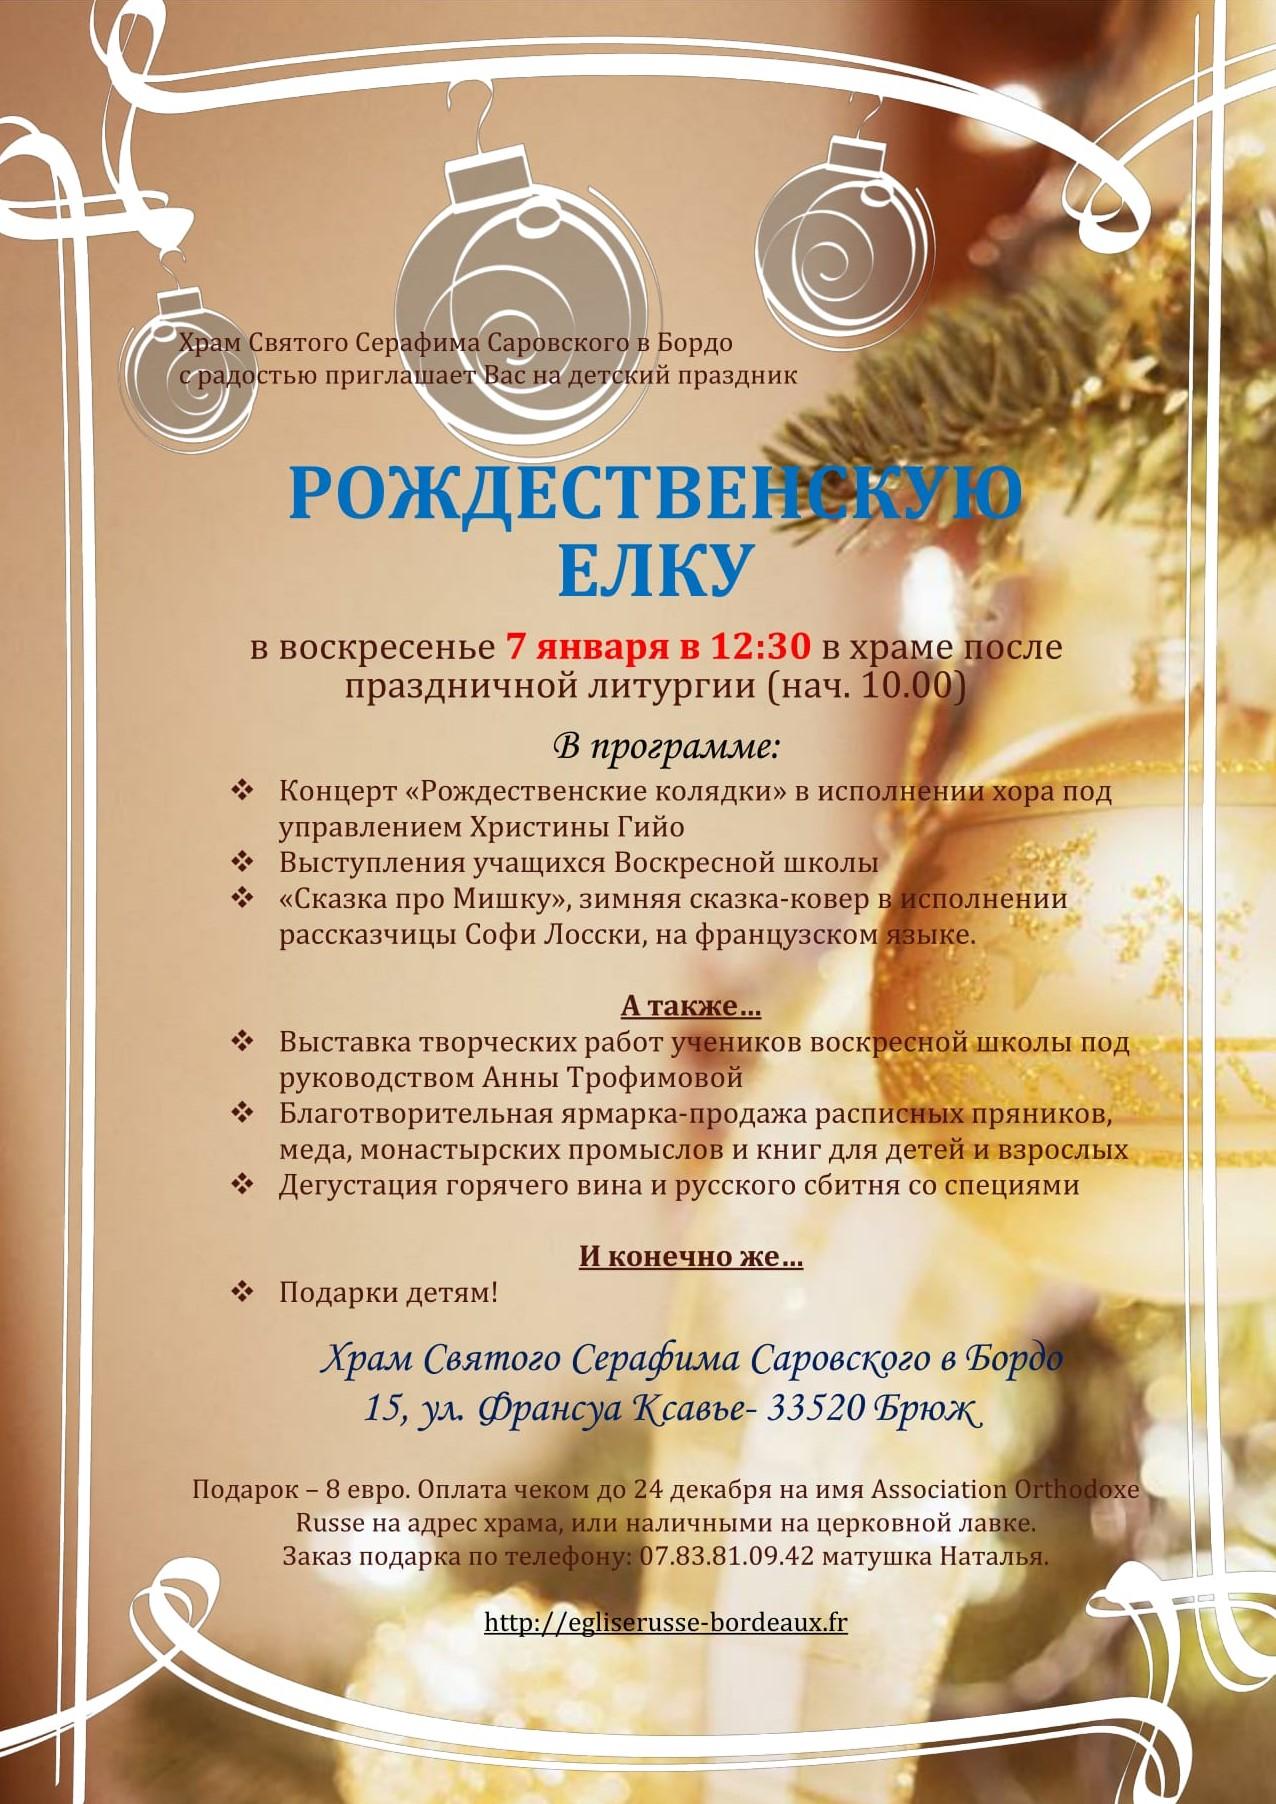 "noel orthodoxe 2018 date Приглашение на детский праздник ""Рождественская елка"" 7 января  noel orthodoxe 2018 date"